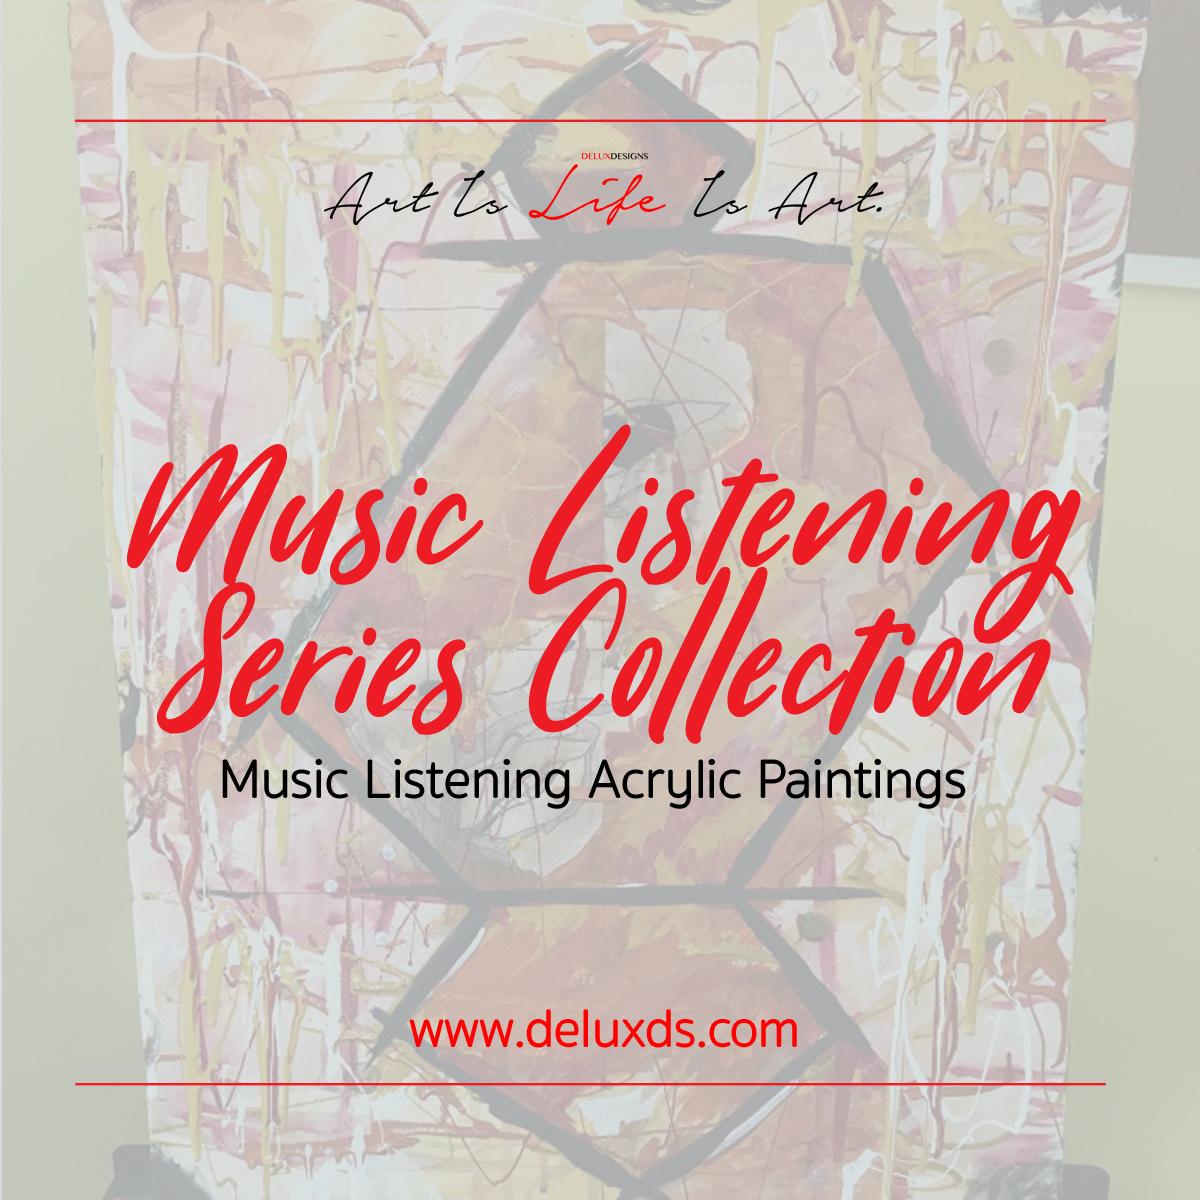 Music Listening Series